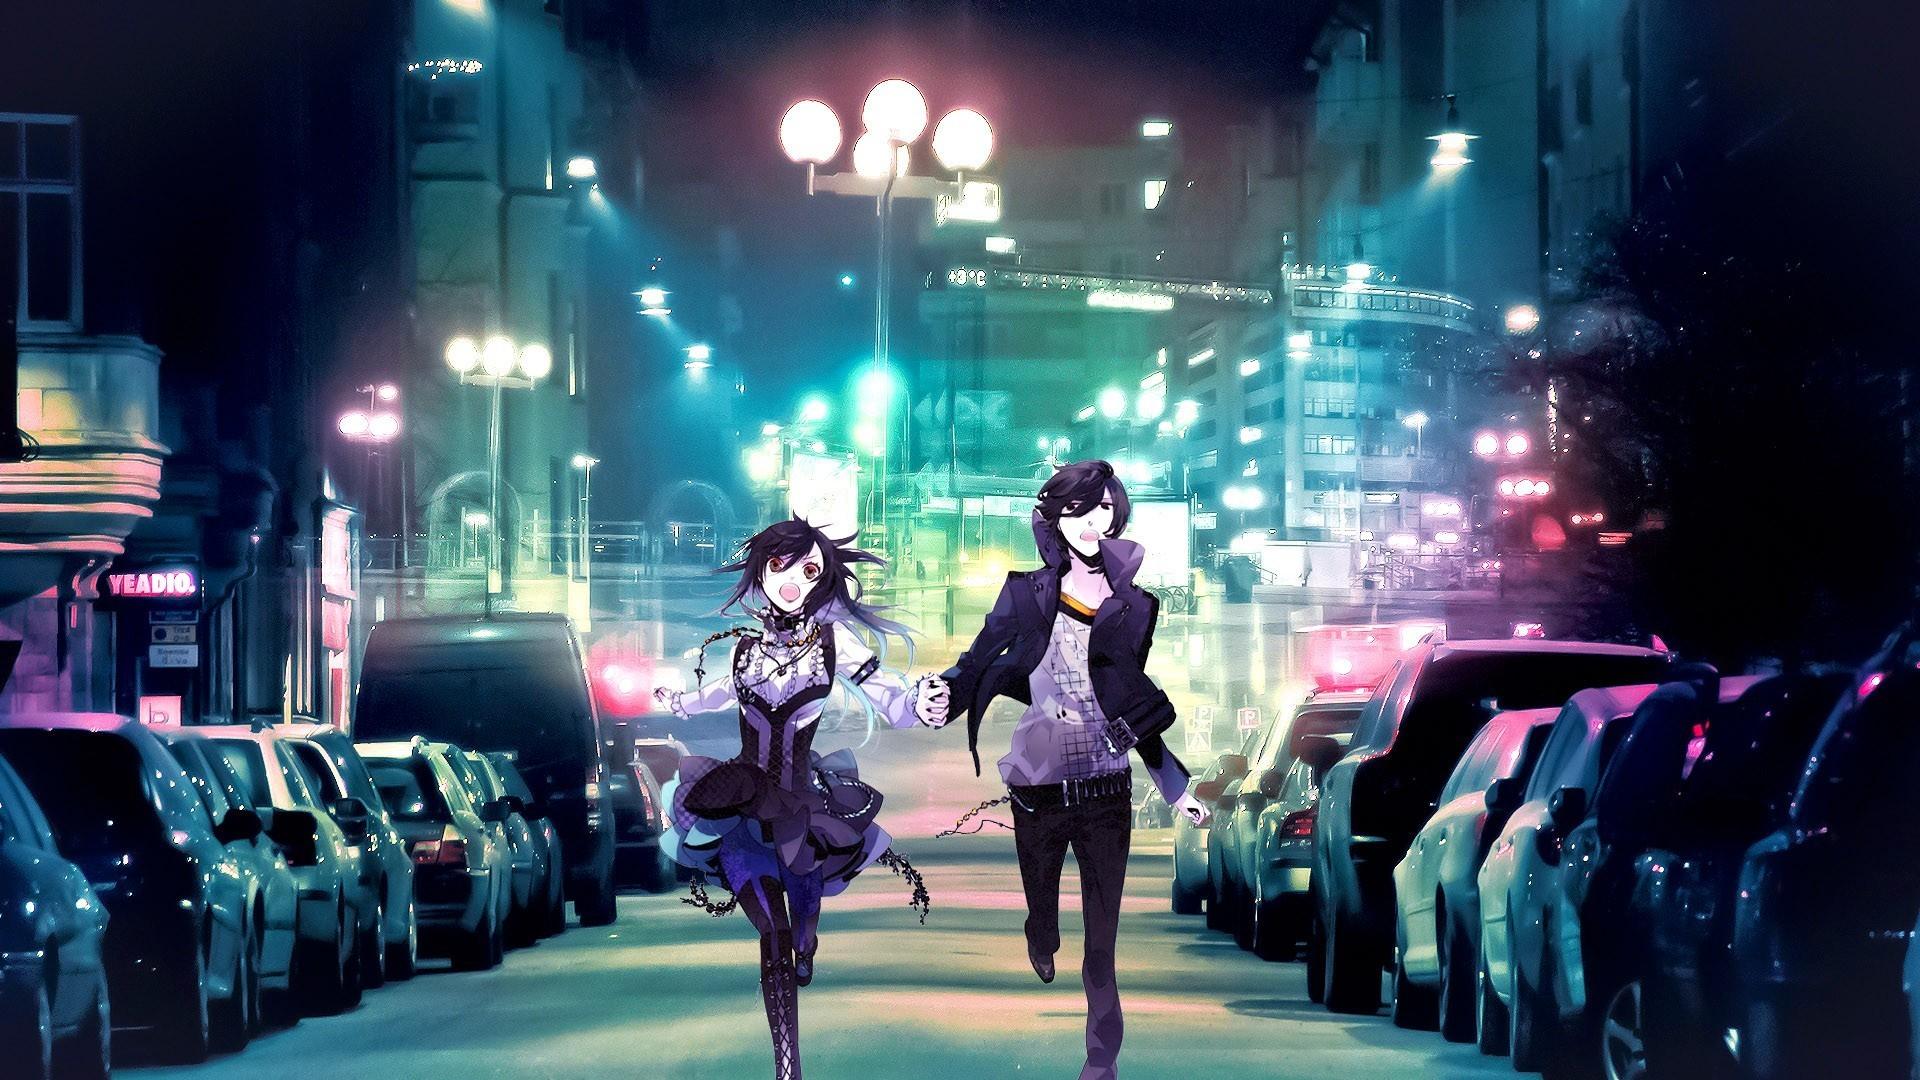 Explore and share Cute Anime Couple Wallpaper on WallpaperSafari